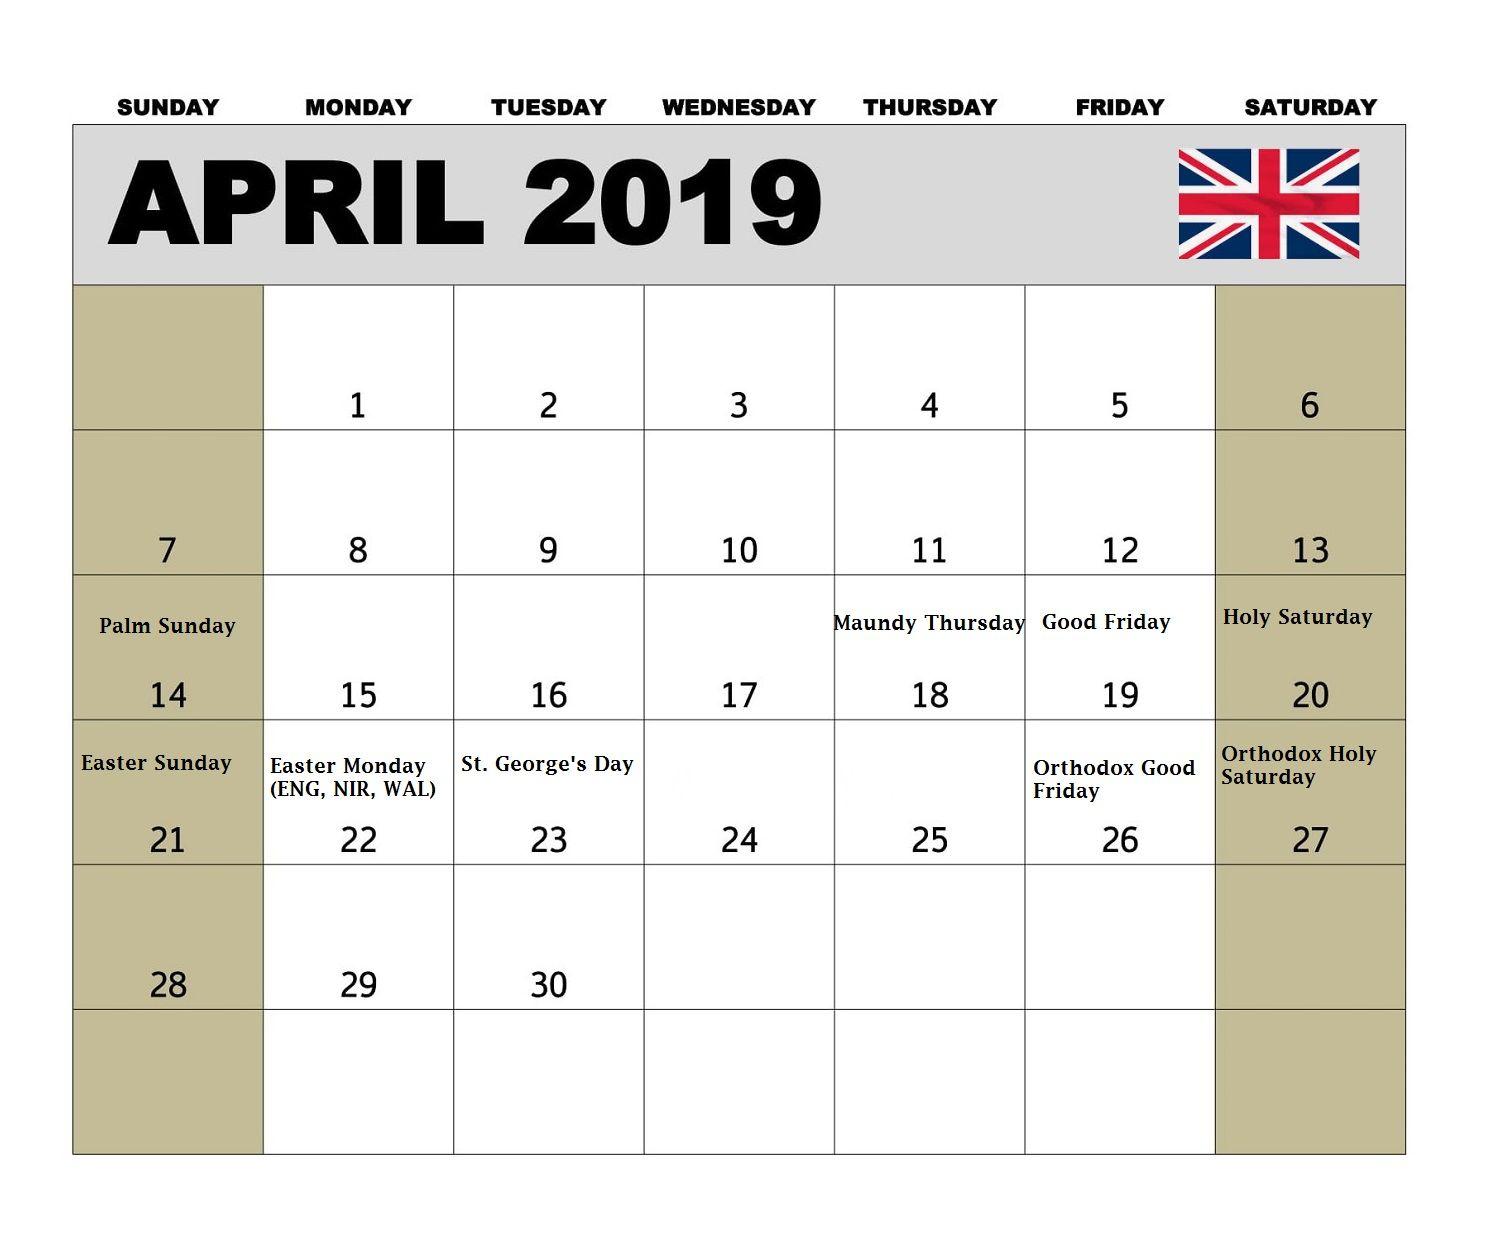 United Kingdom April 2019 Holidays Calendar